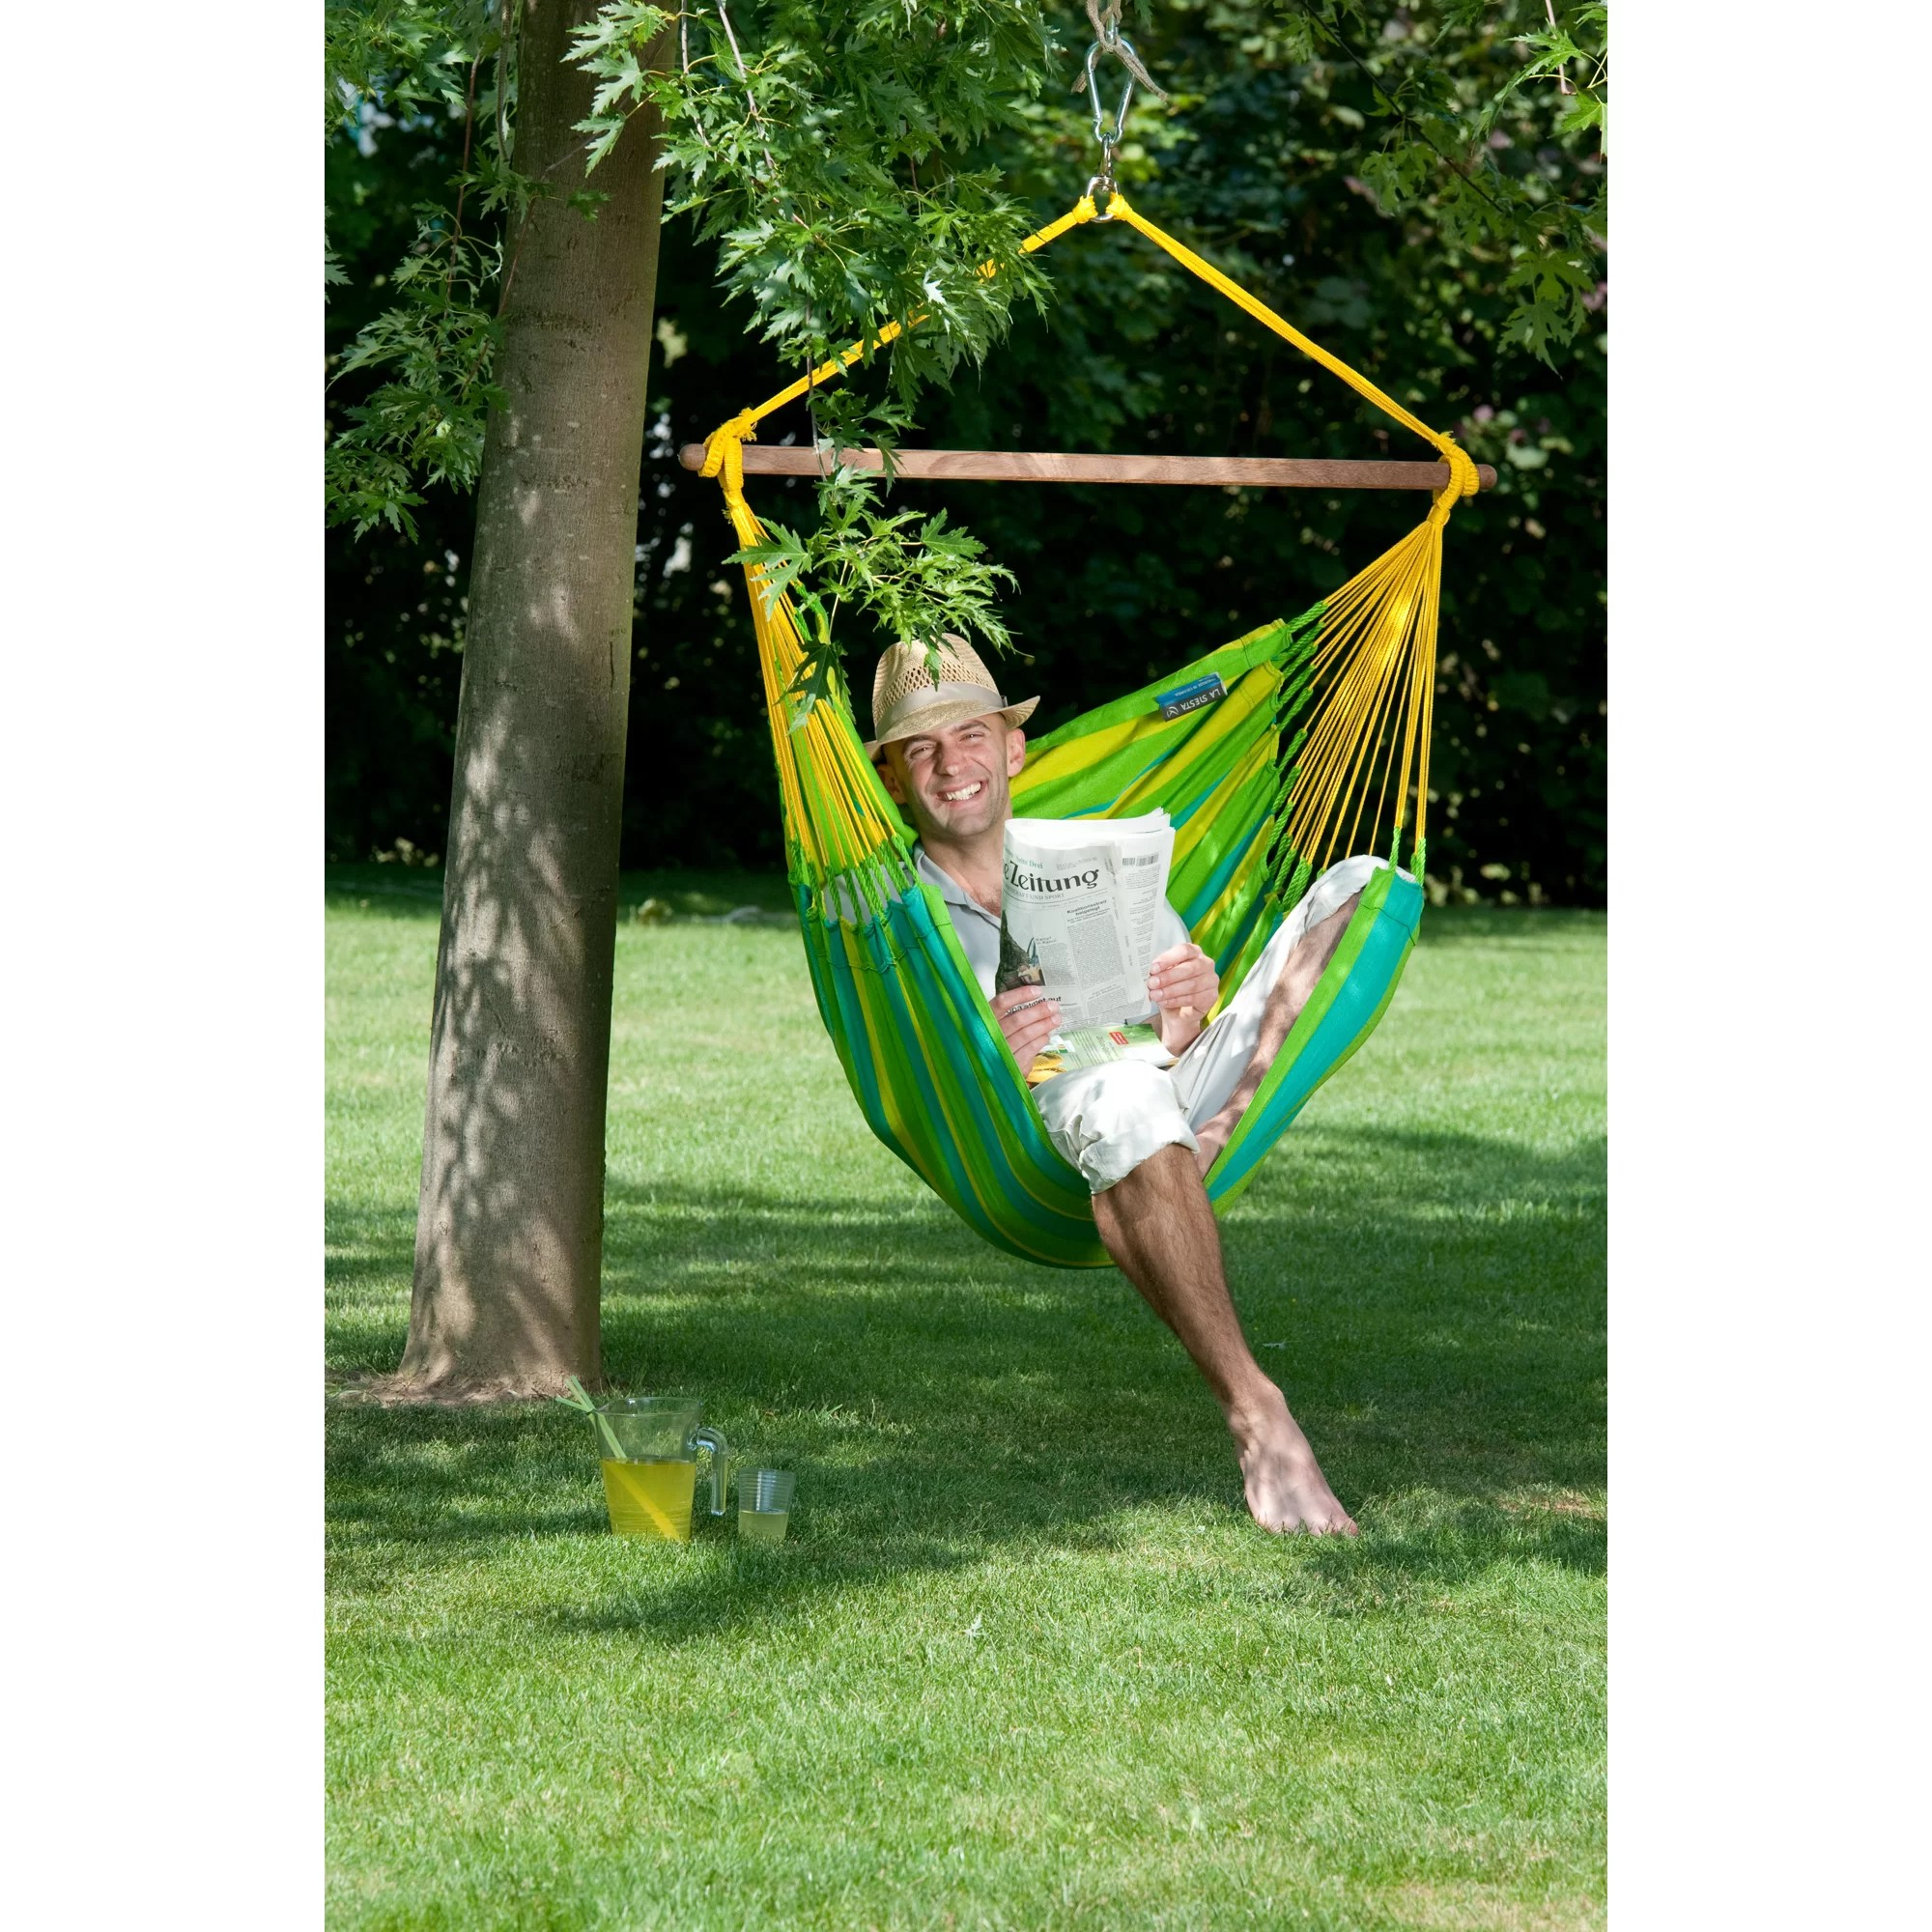 la siesta hammock chair covers design knitspiringodyssey outdoor patio furniture tree hammocks